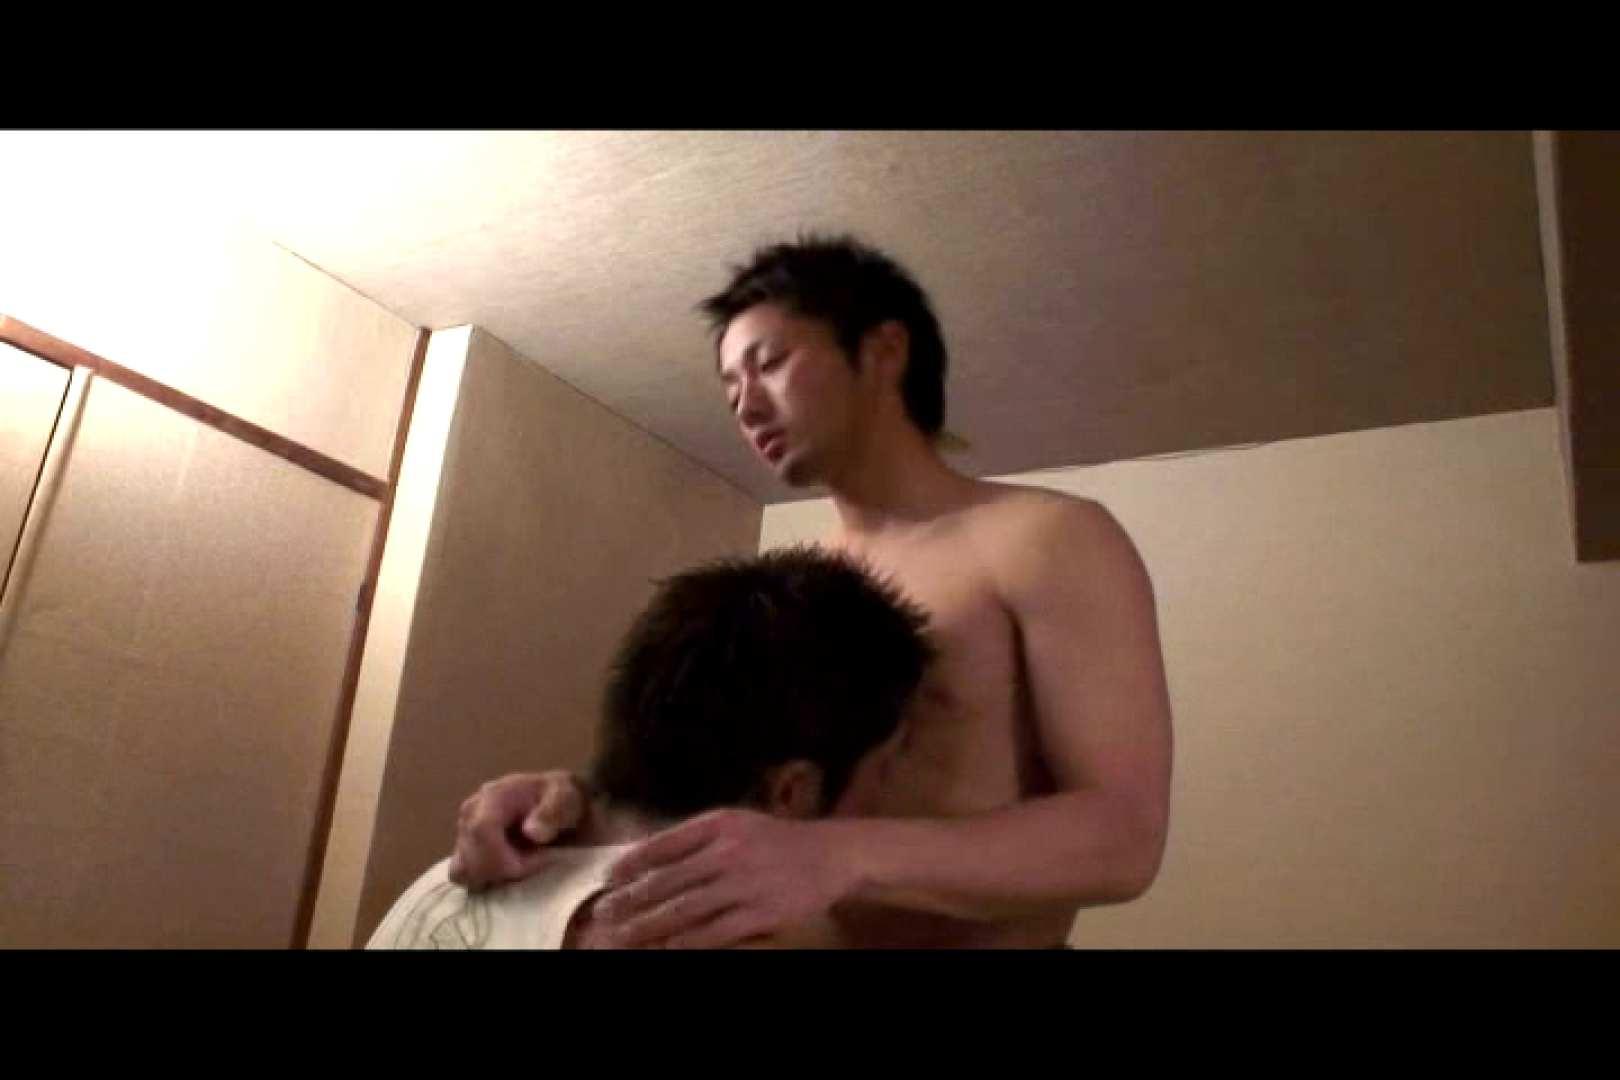 Bistro「イケメン」~Mokkori和風仕立て~vol.01 イケメン  89pic 65